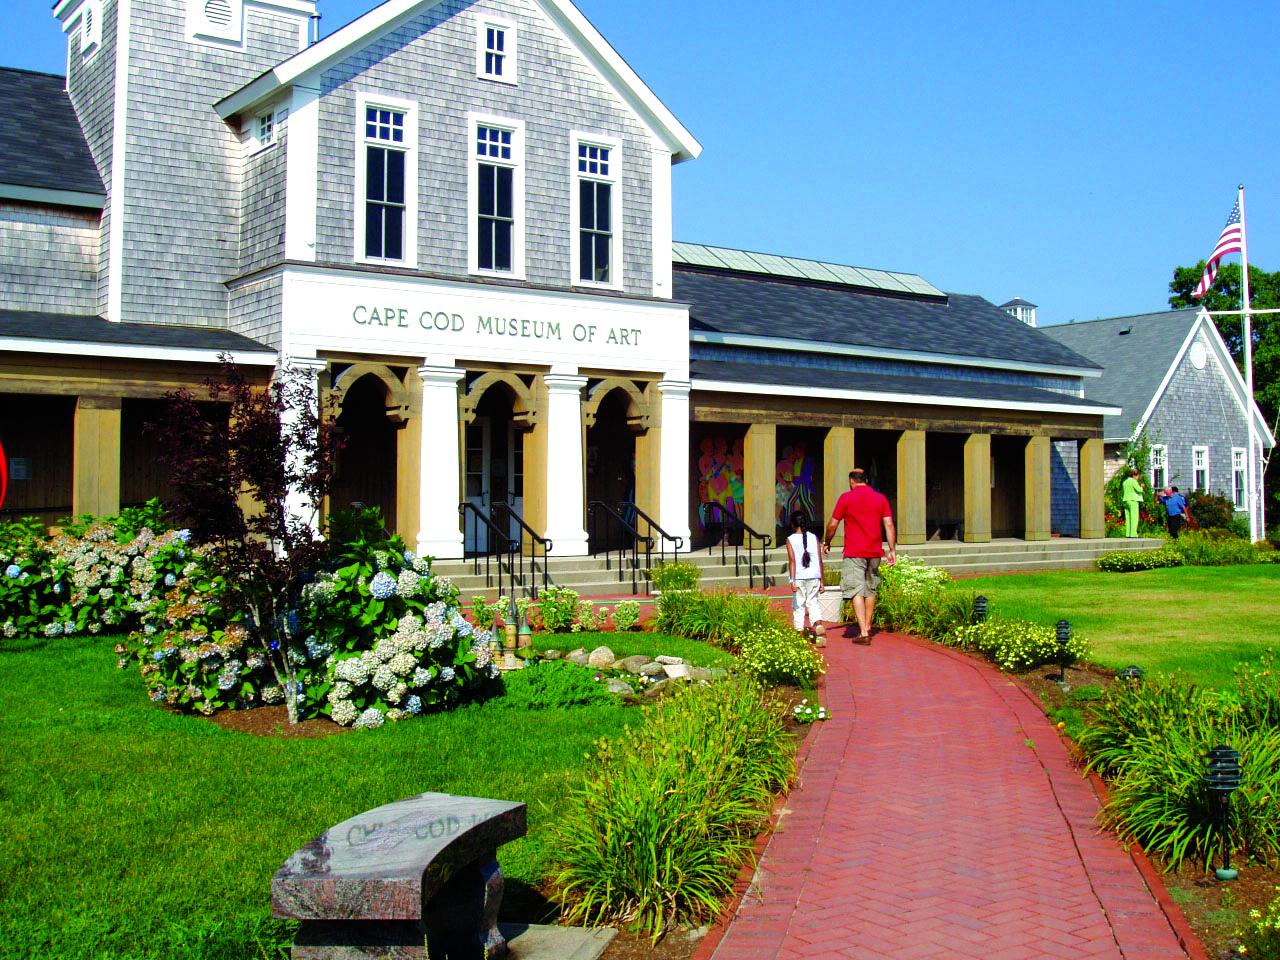 Cape Cod Museum Trail  The Cape Cod Museum Of Art